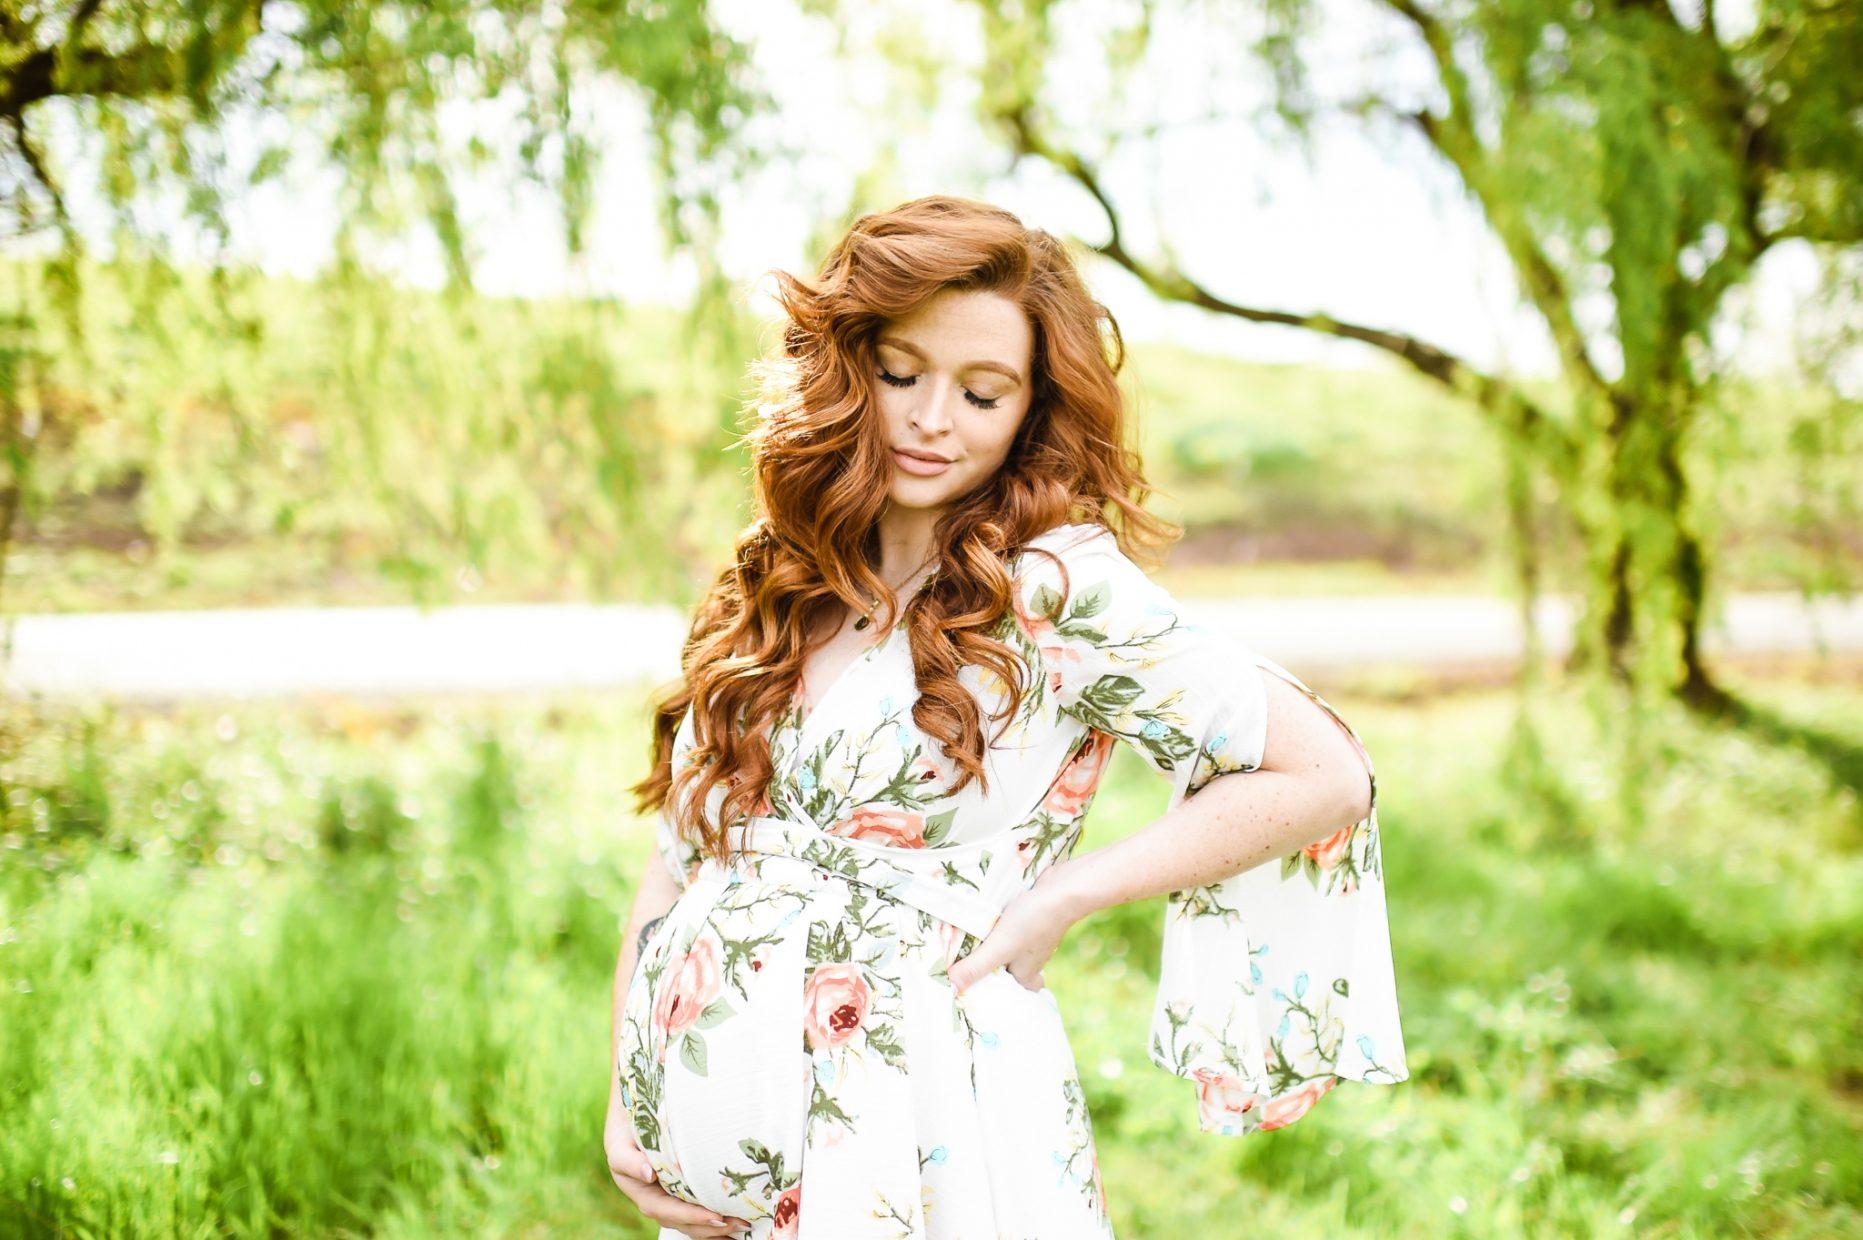 stephanie-parsley-photography-arkansas-maternity-photographer (8 of 47)